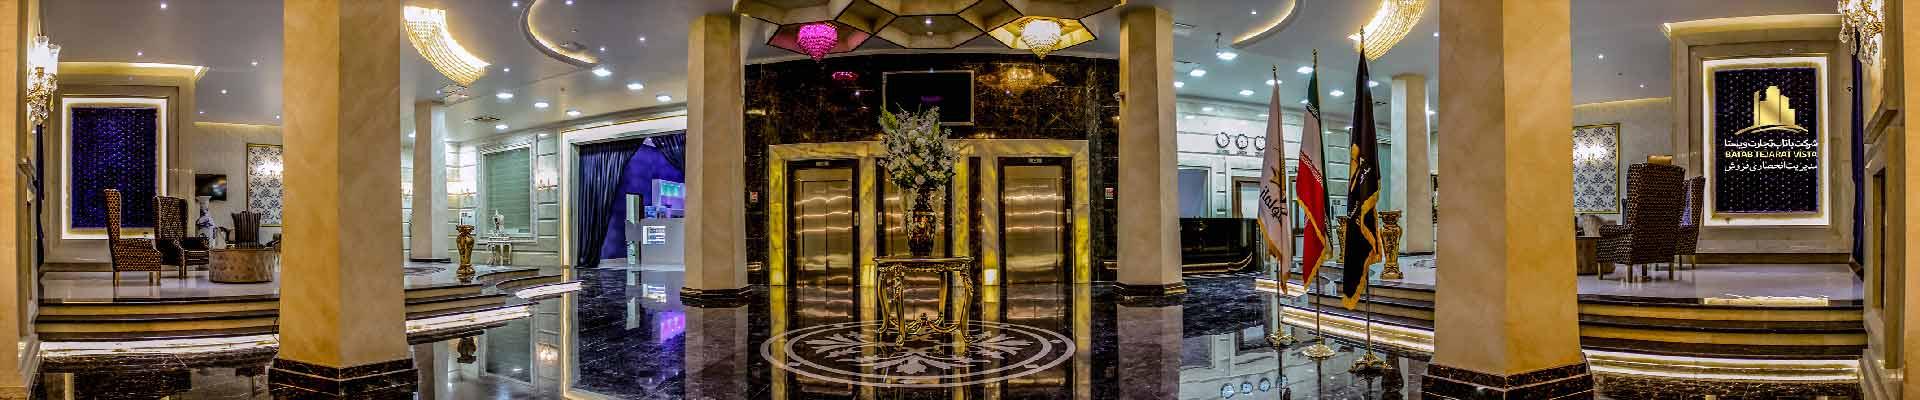 آسانسور هتل